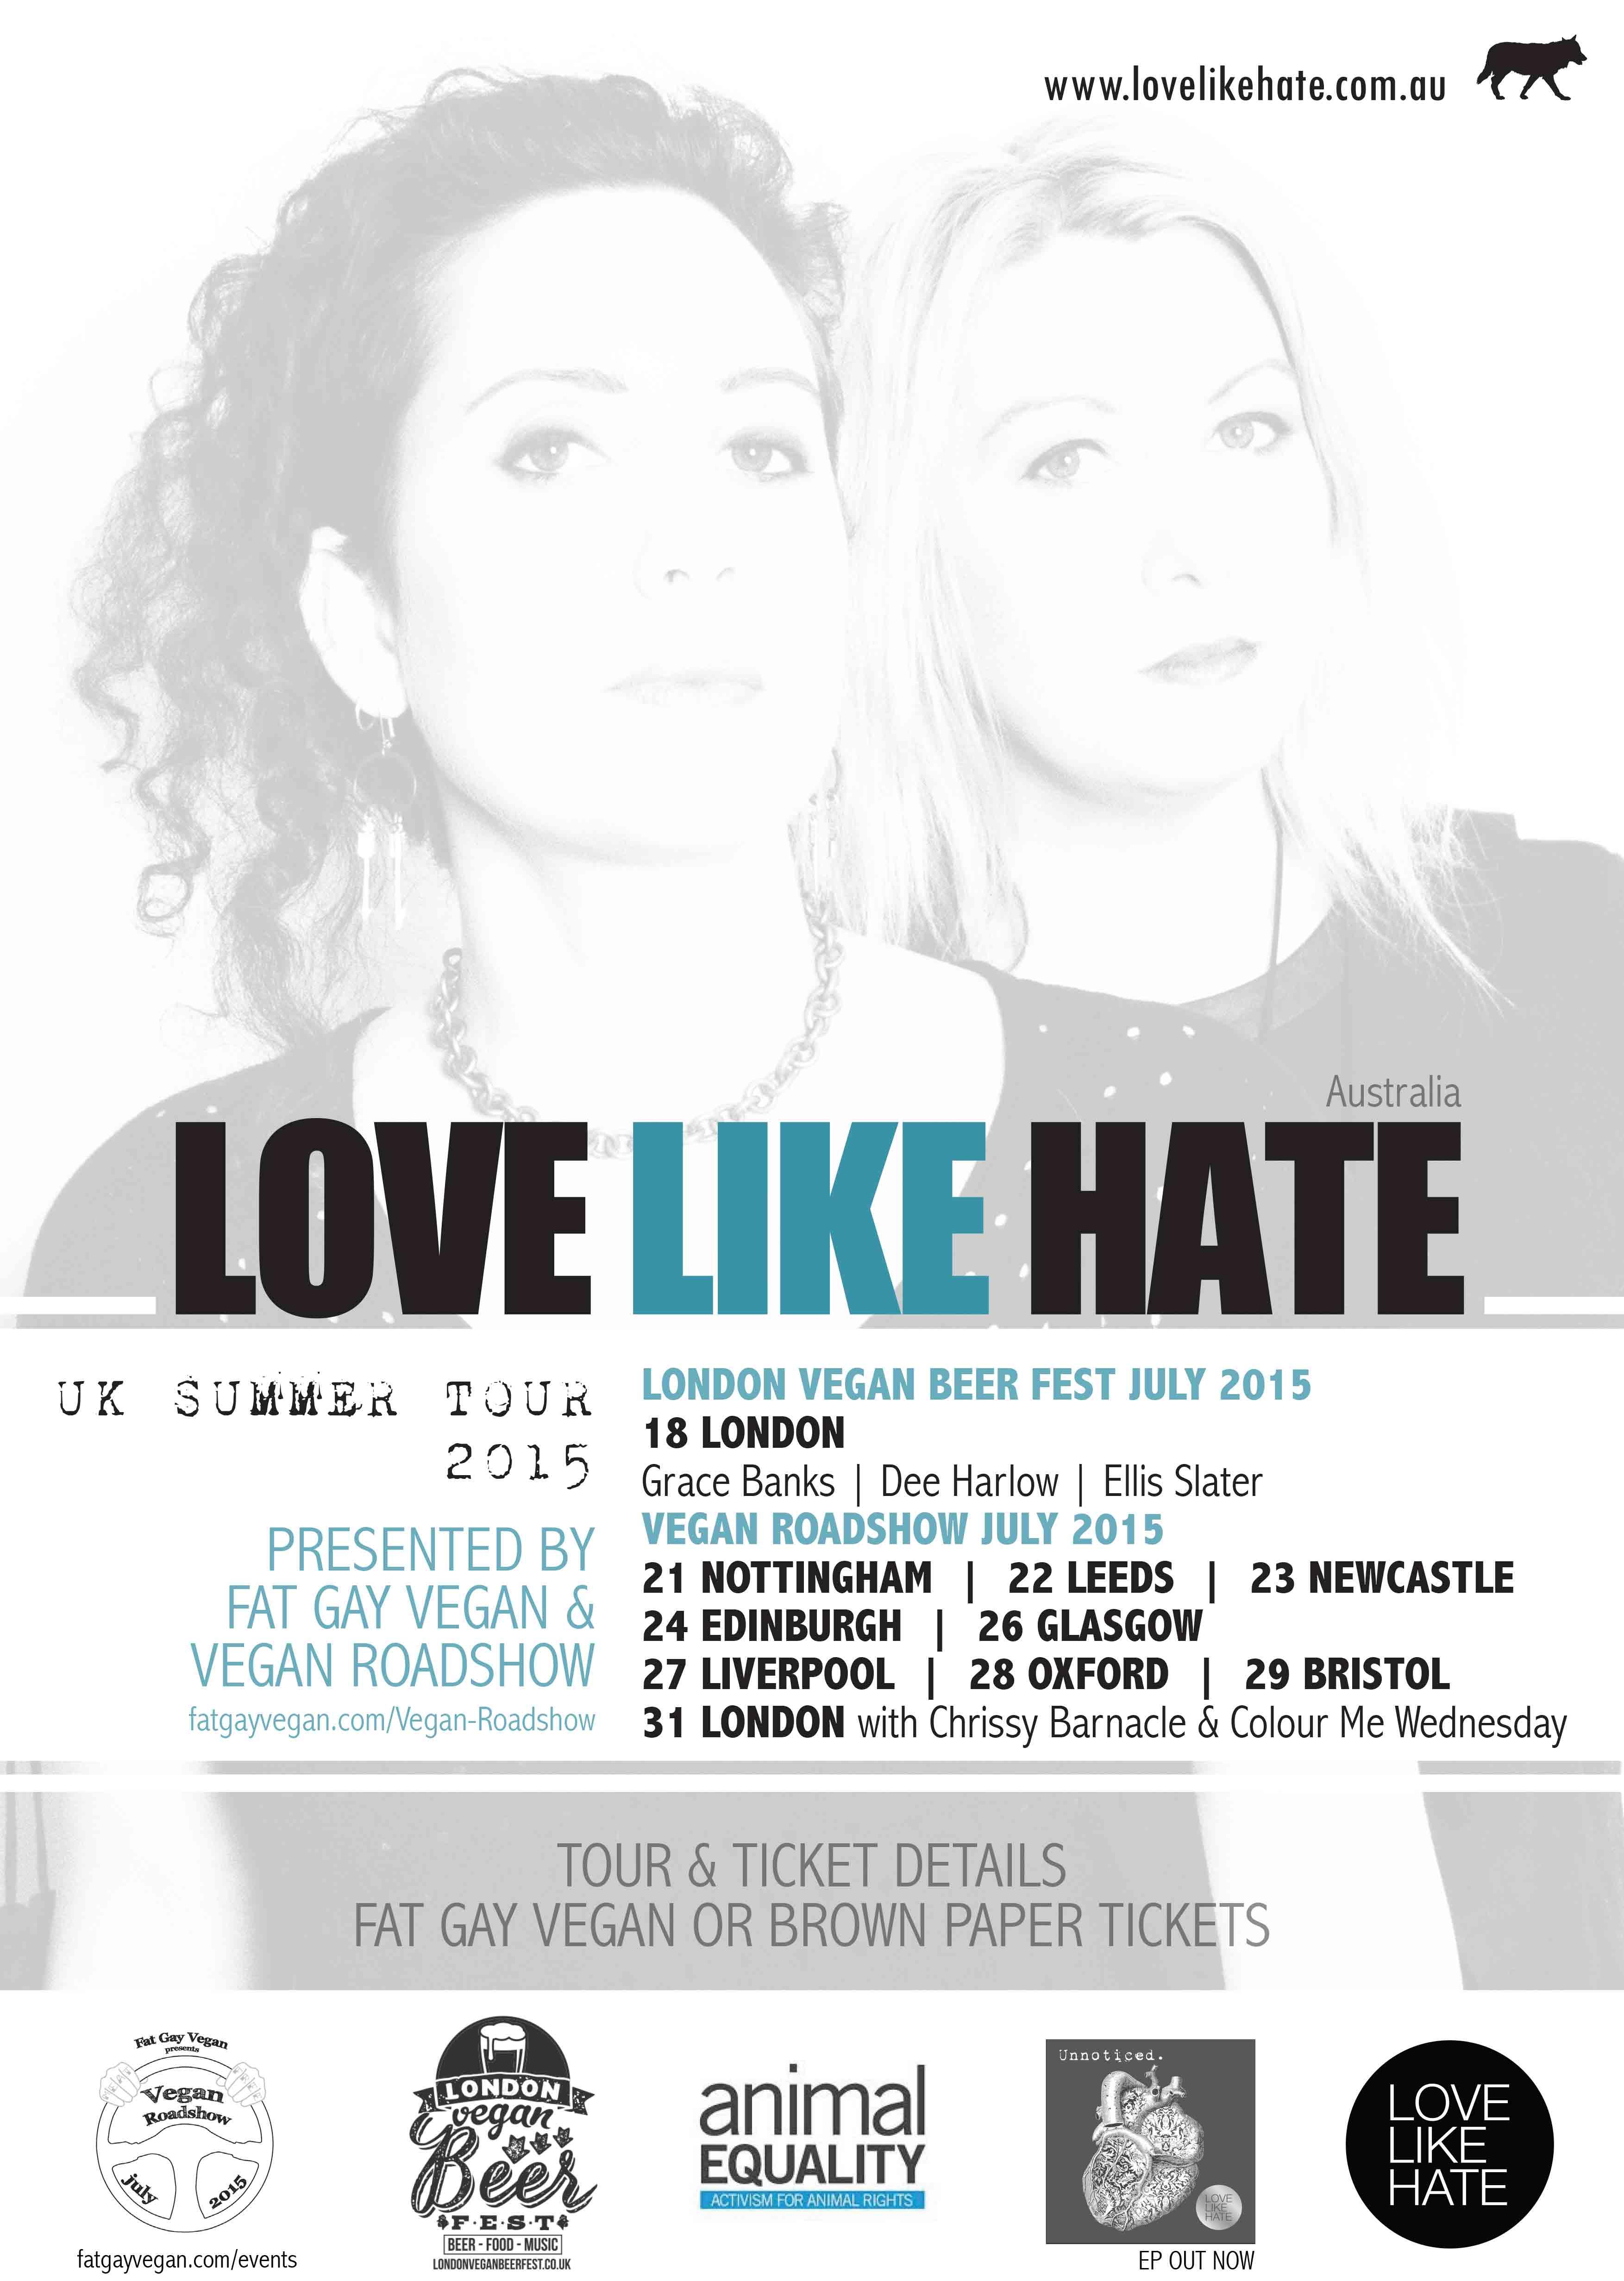 https://i0.wp.com/fatgayvegan.com/wp-content/uploads/2015/04/LoveLikeHate-2015-Tour-UK-2.jpg?fit=%2C&ssl=1